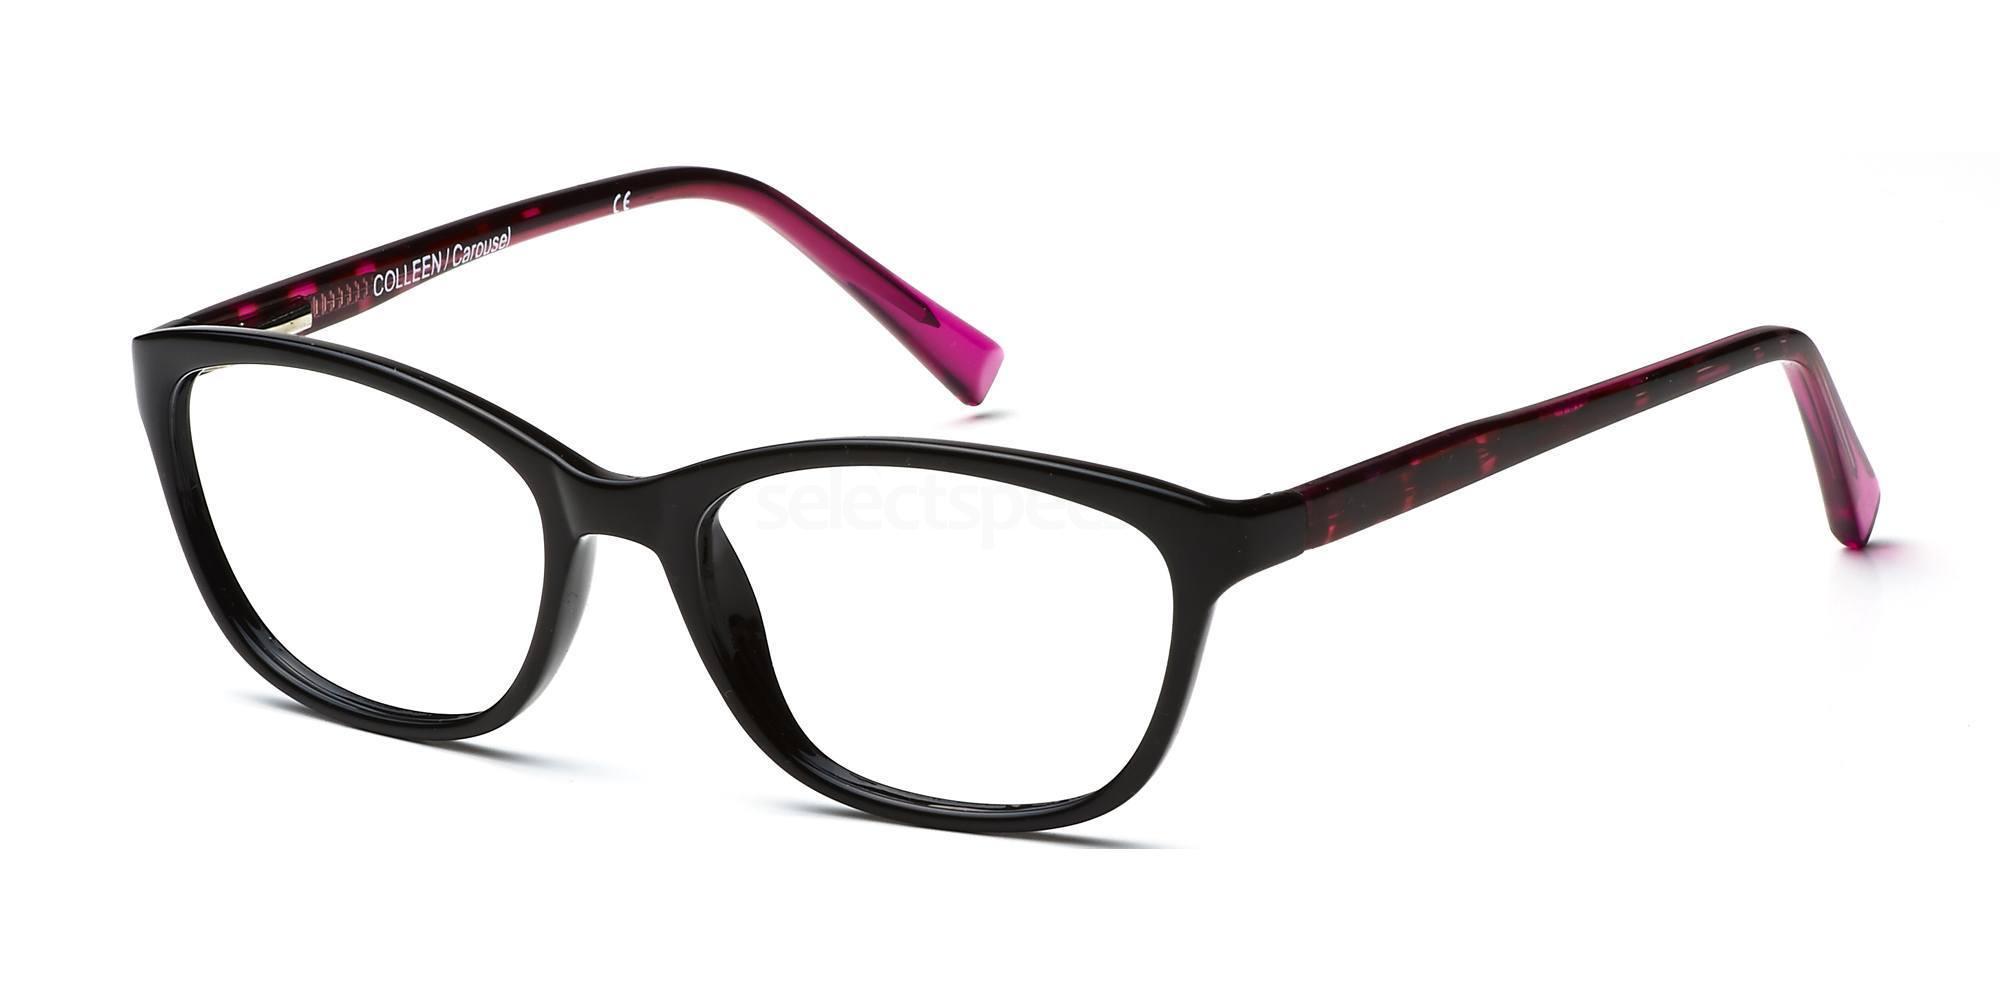 C1 COLLEEN Glasses, Carousel